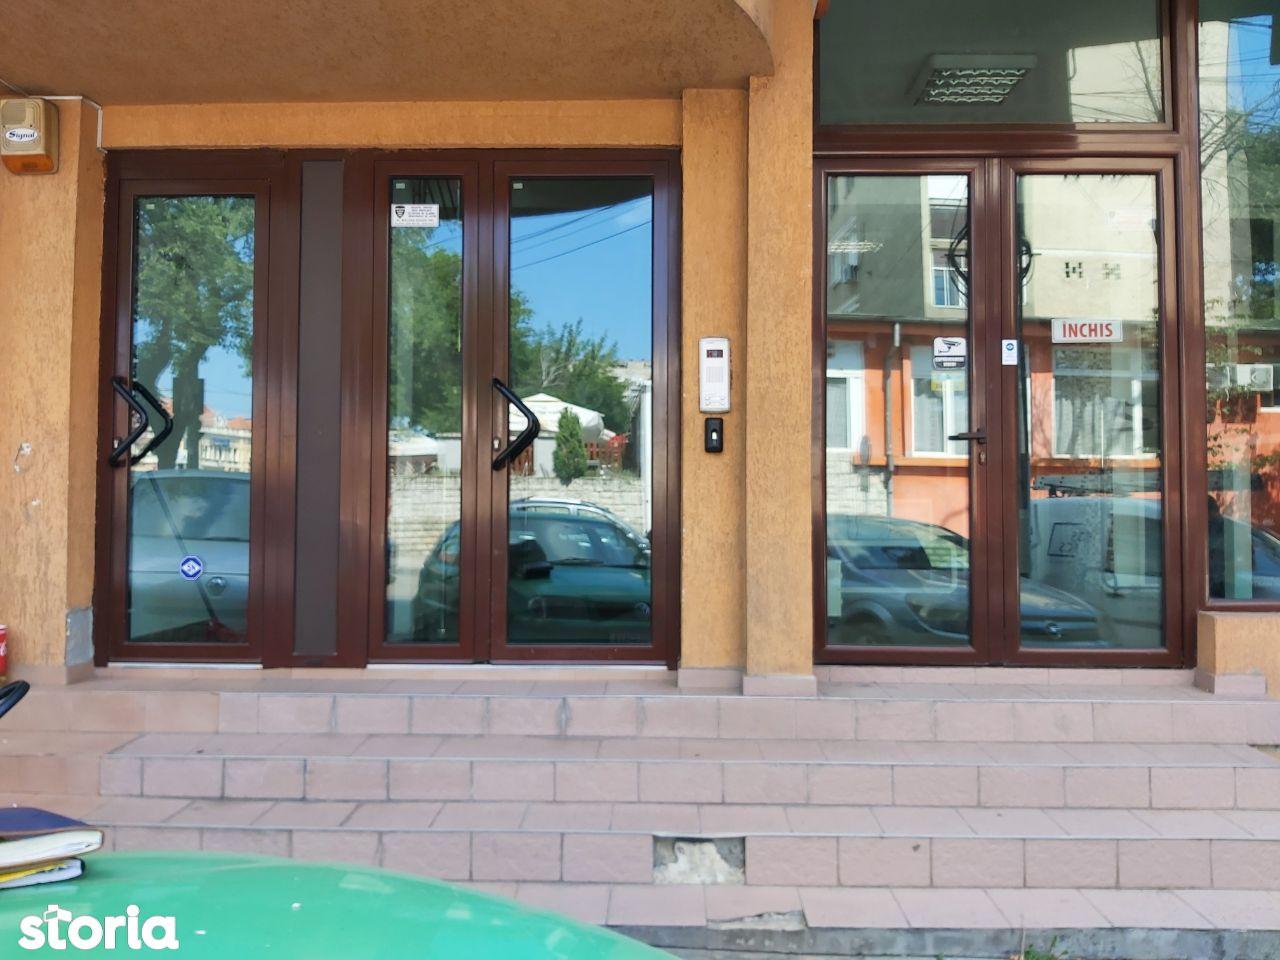 Spatiu comercial de inchiriat situat in Oradea zona Garii